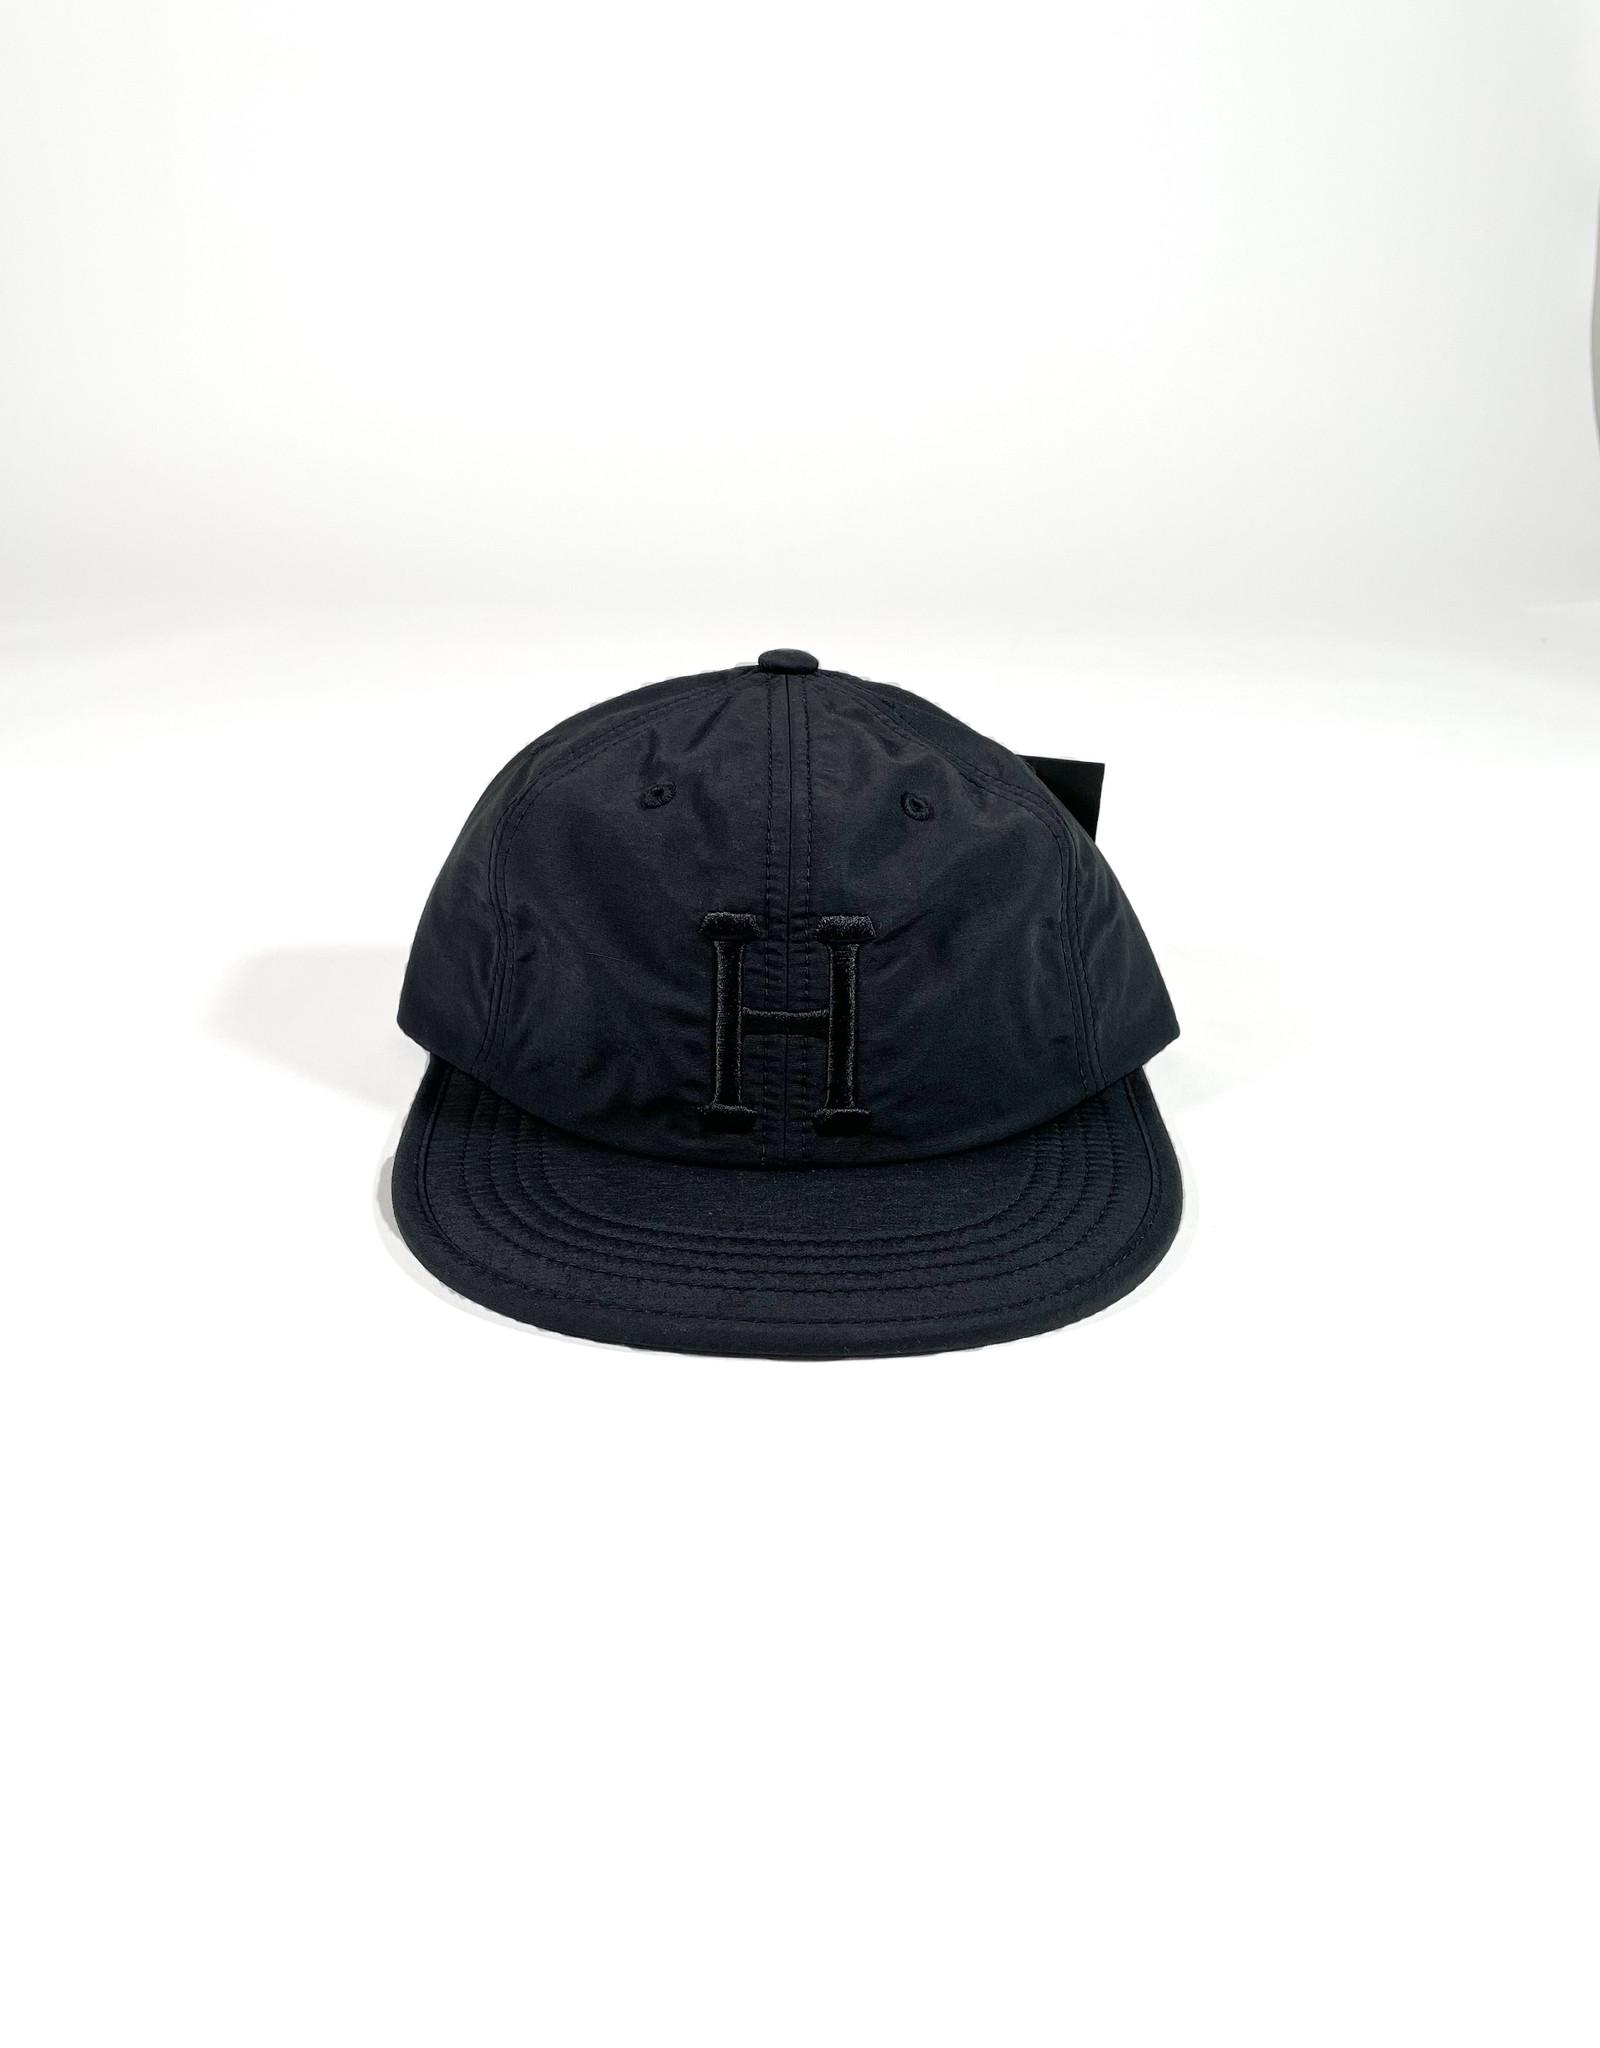 HUF FORMLESS CLASSIC H 6 PANEL - BLACK